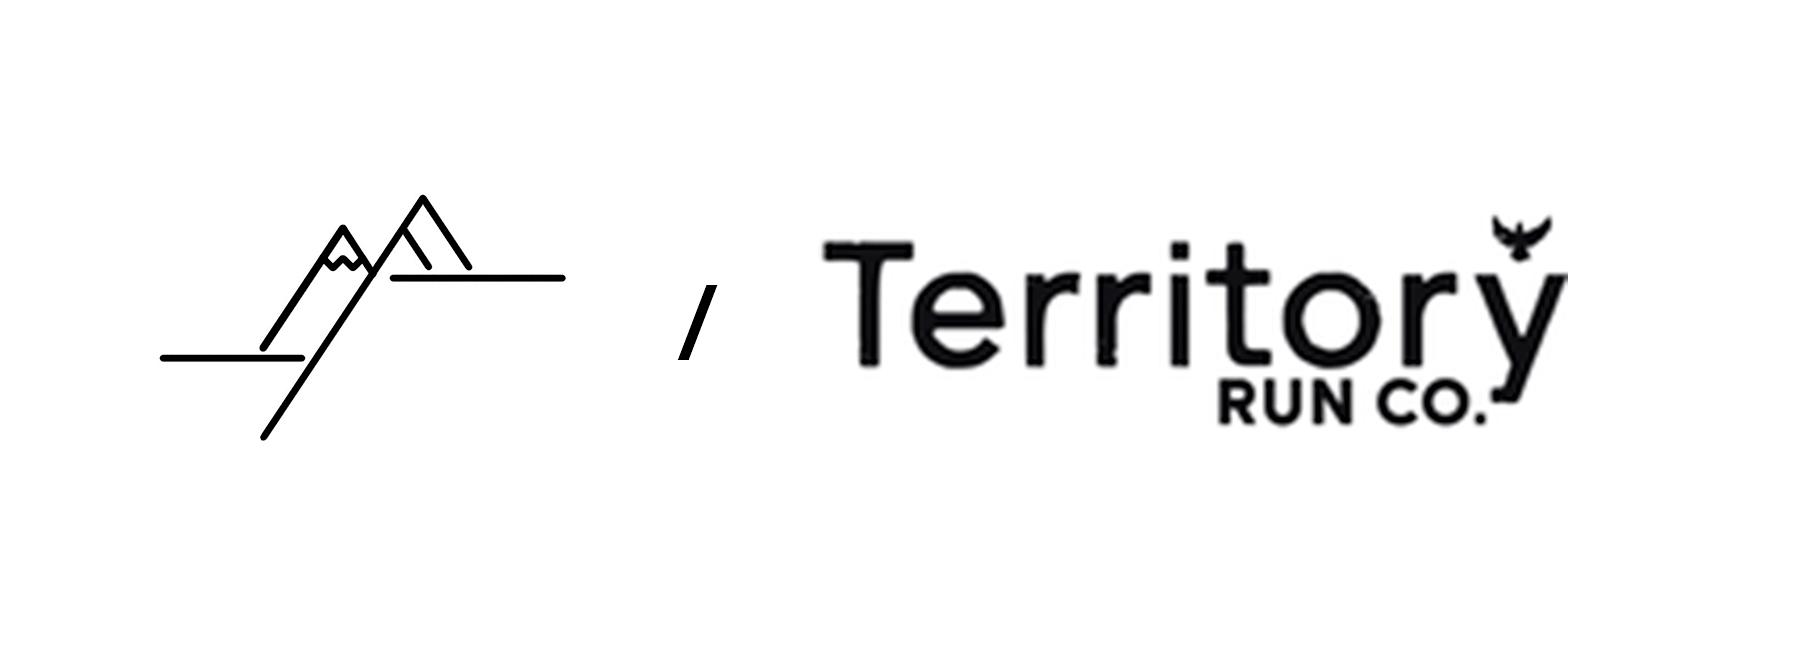 alpenflo_slash_Territory (1 of 1).jpg